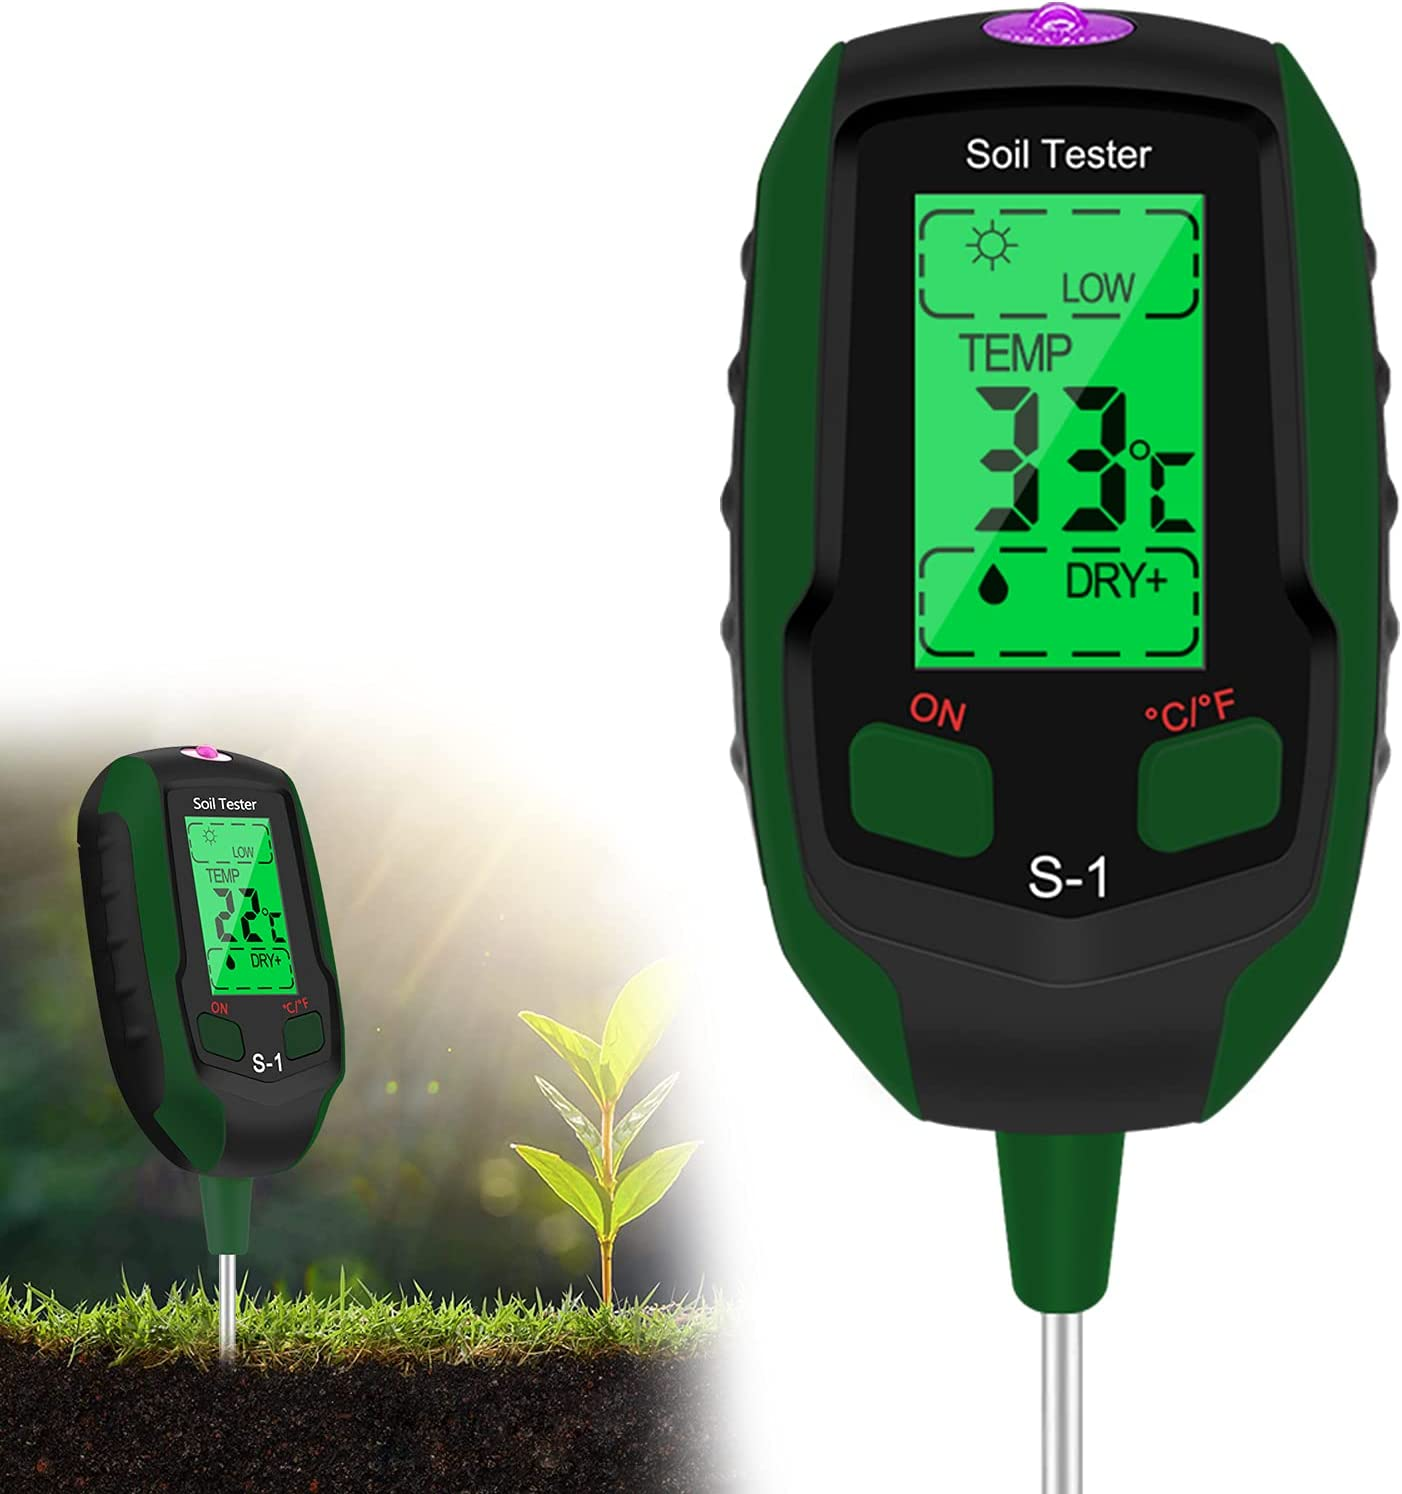 Esimen Upgraded 4-in-1 Soil PH Meter, Soil Tester Moisture with Light/PH/Temperatur, Digital Plant Thermometer Test, Moisture Meter Light for Gardening, Farming, Indoor and Outdoor Plants (S1, Green)